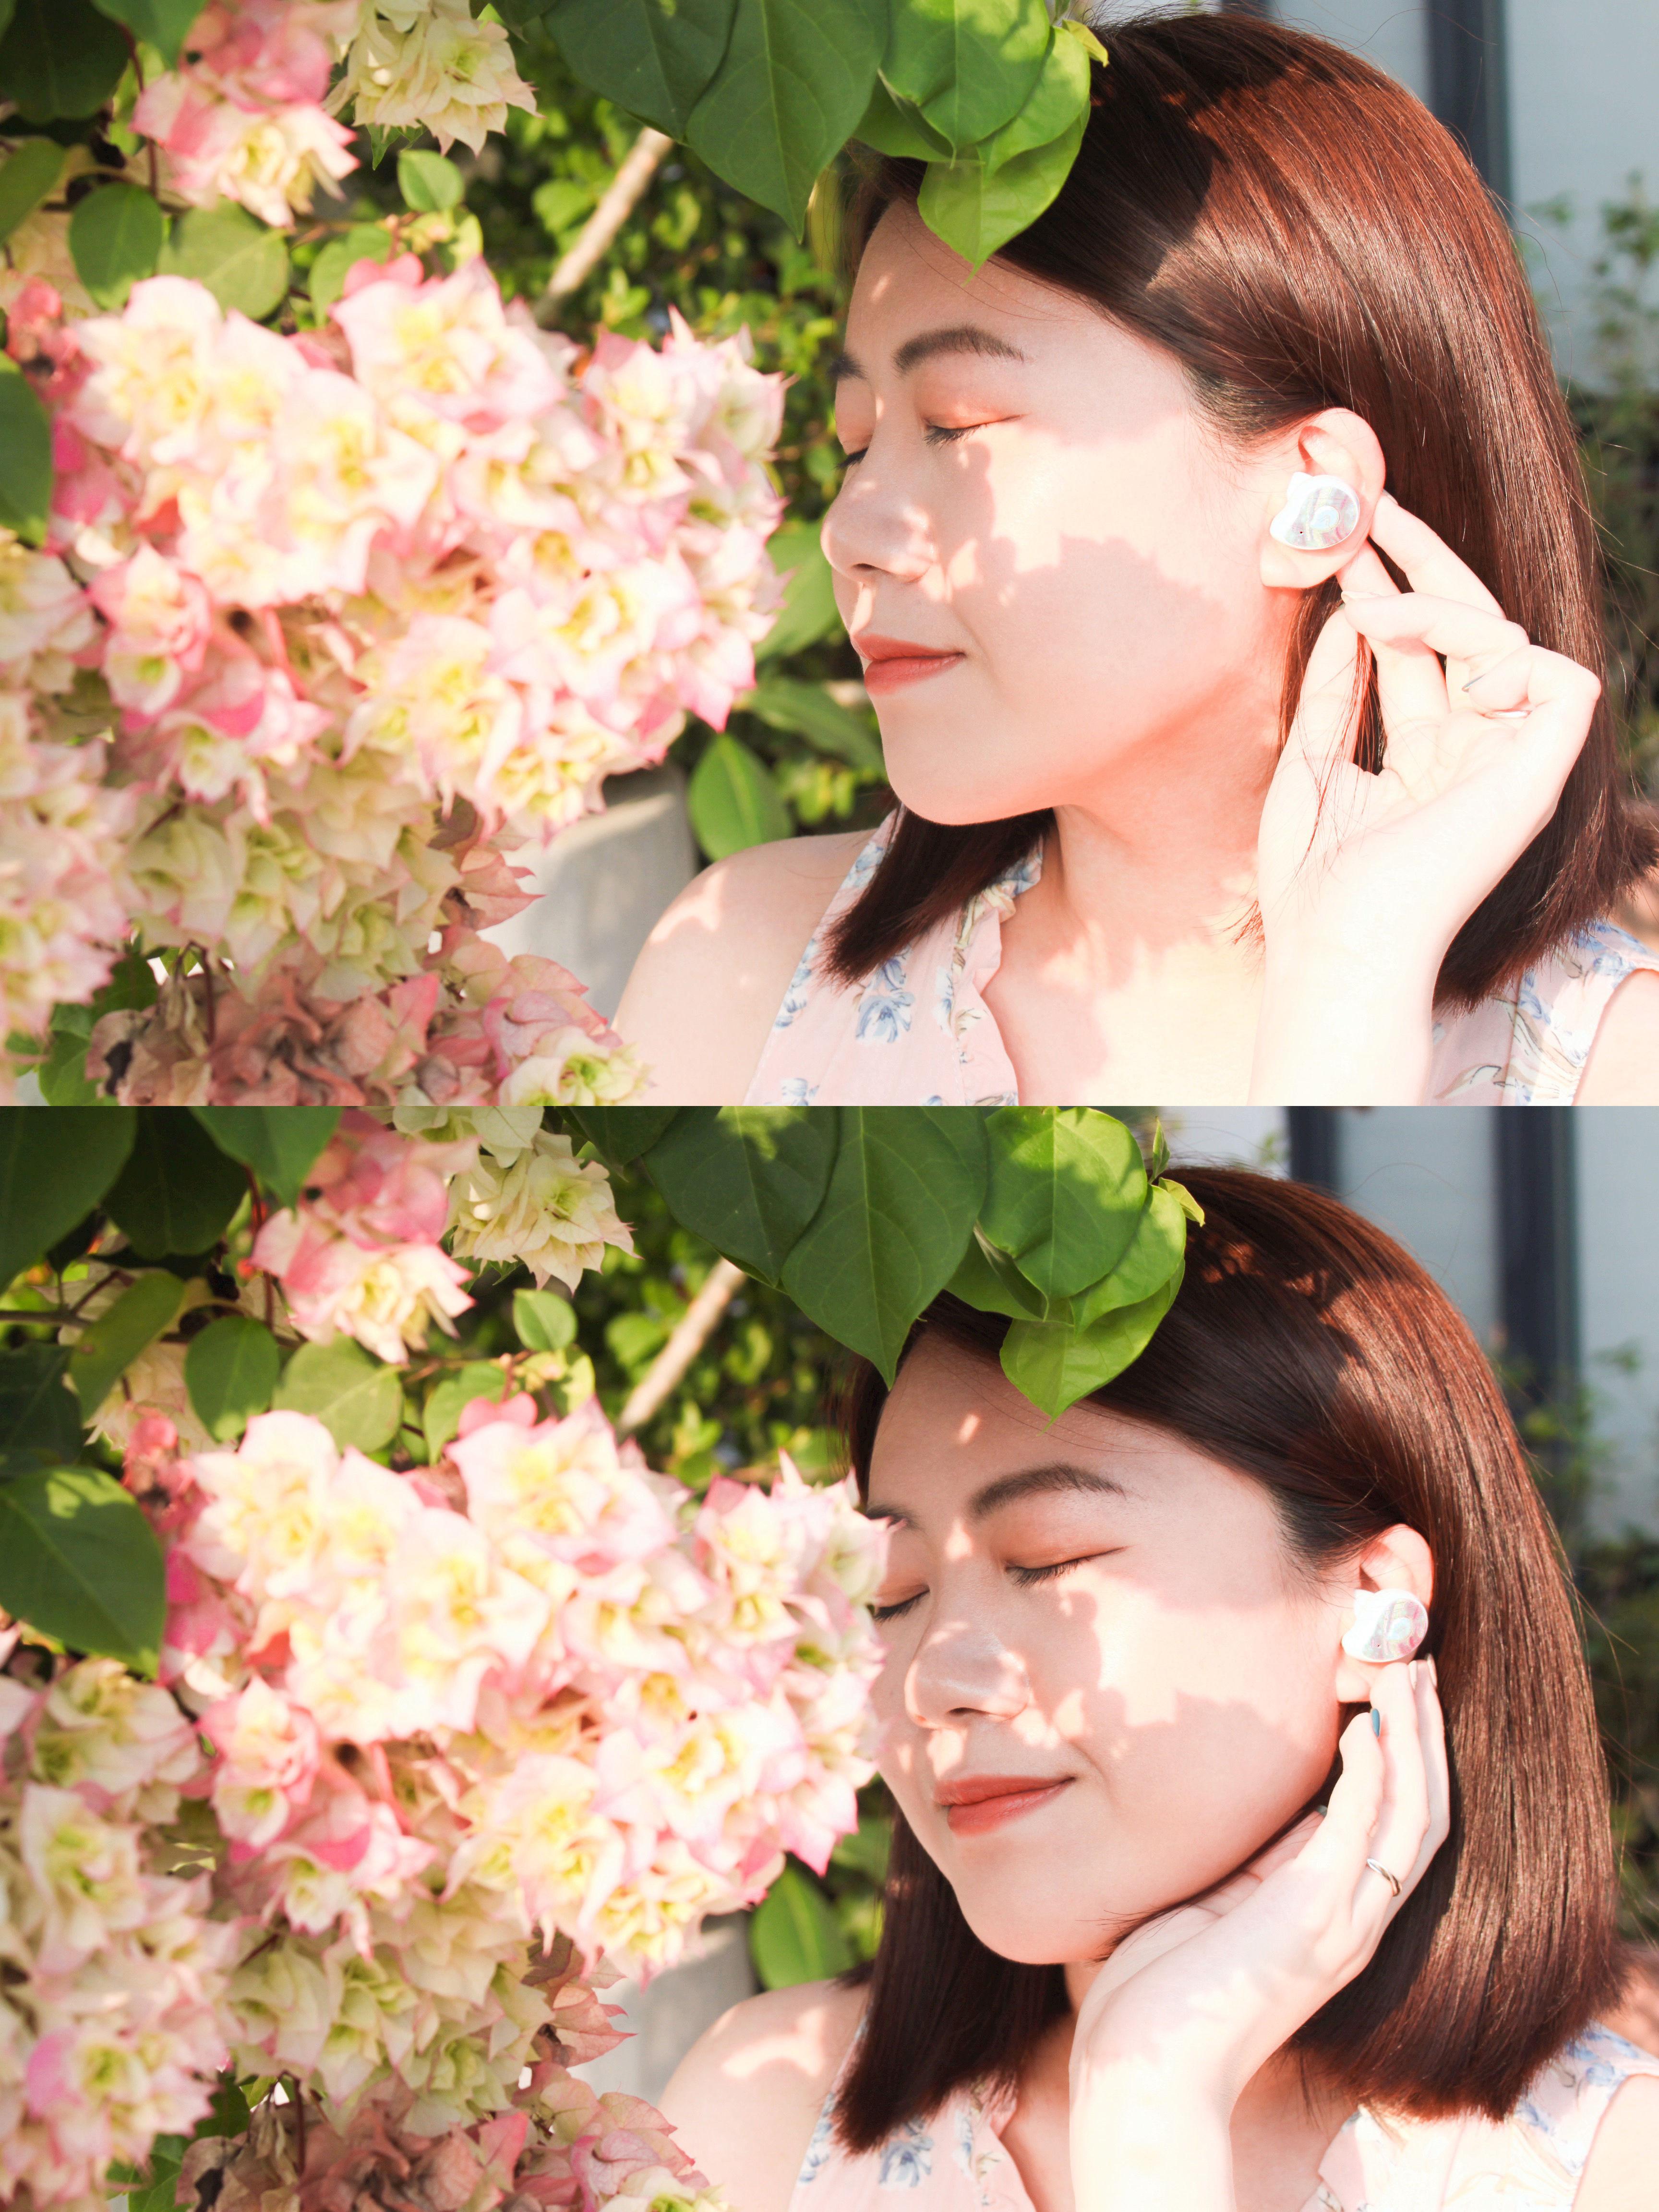 OMIX耳機評價_Y6真無線半入耳式_運動藍芽耳機_平價藍芽耳機推薦 (12).jpg